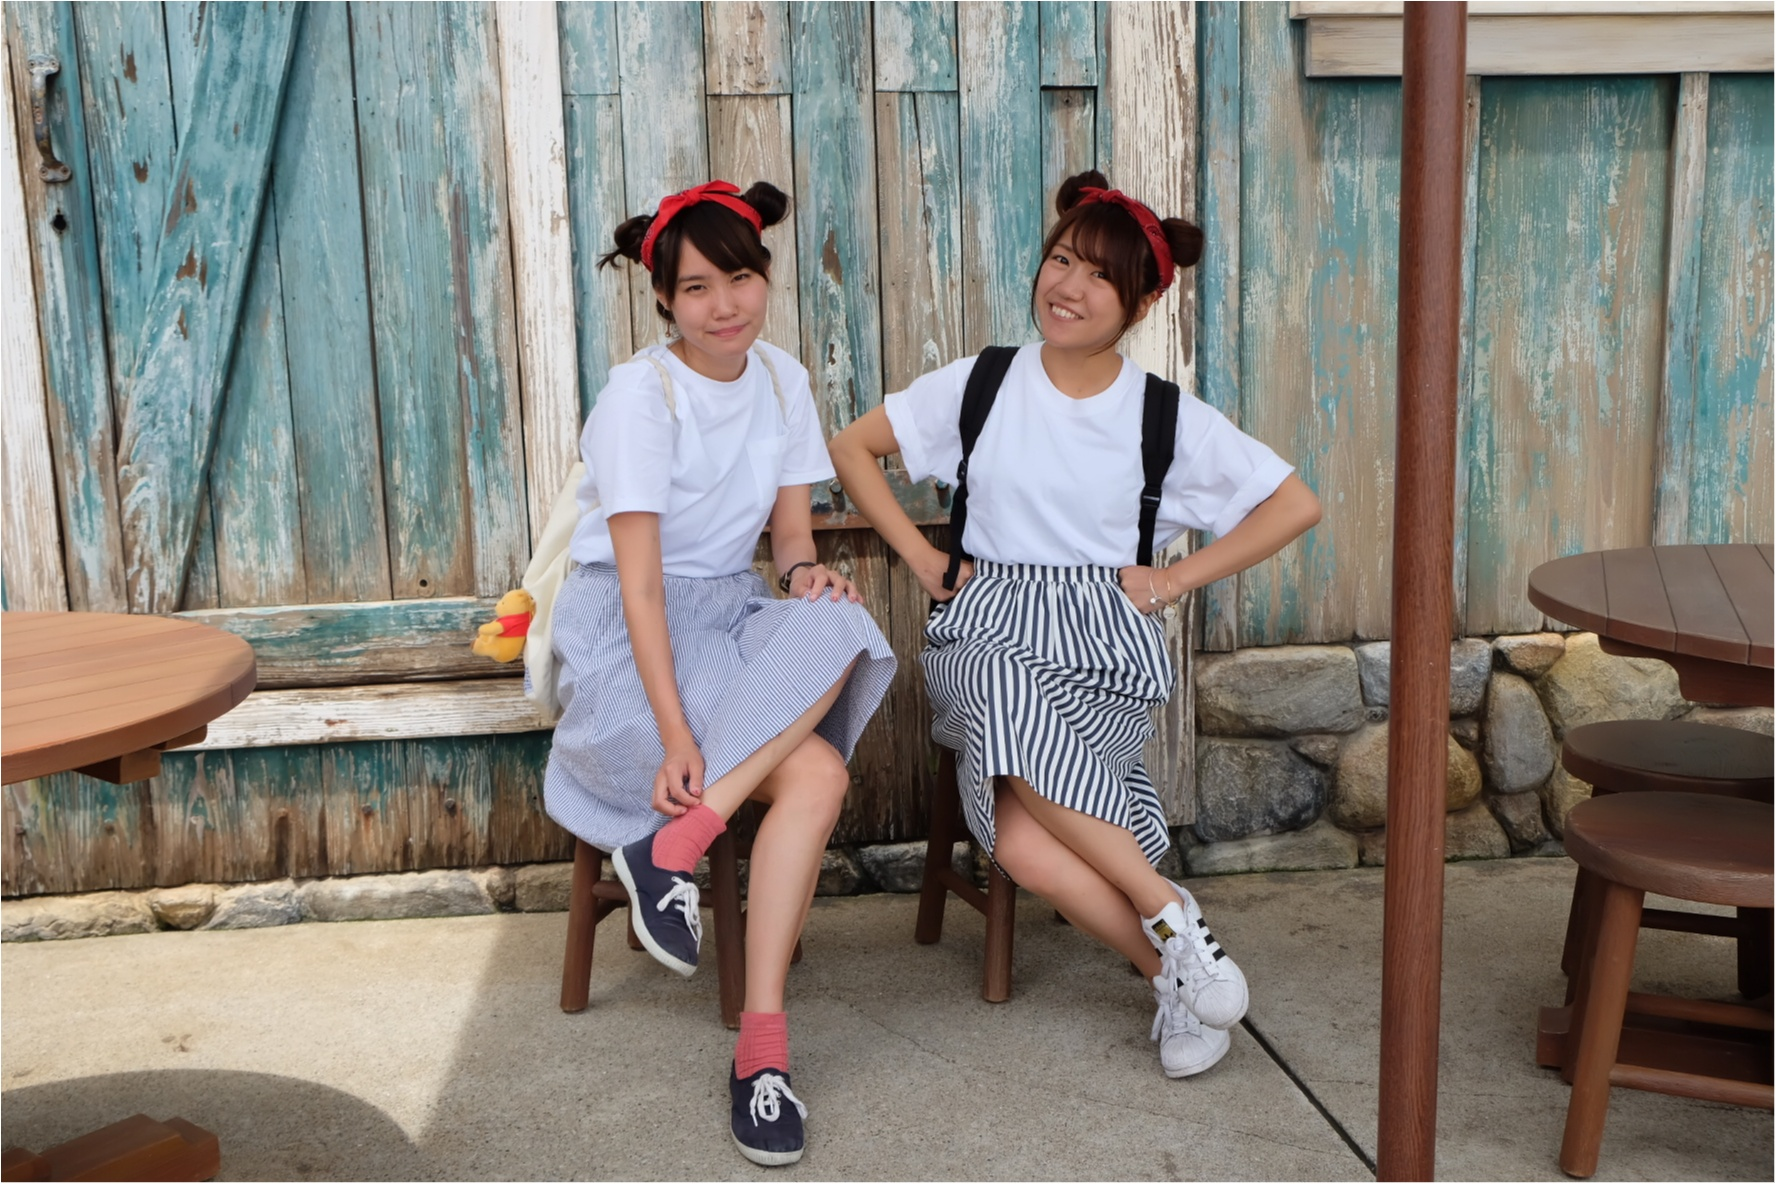 …ஐ TDS 15th anni☆定番から穴場まで撮影スポット10選 ஐ୪¨ଞ_38